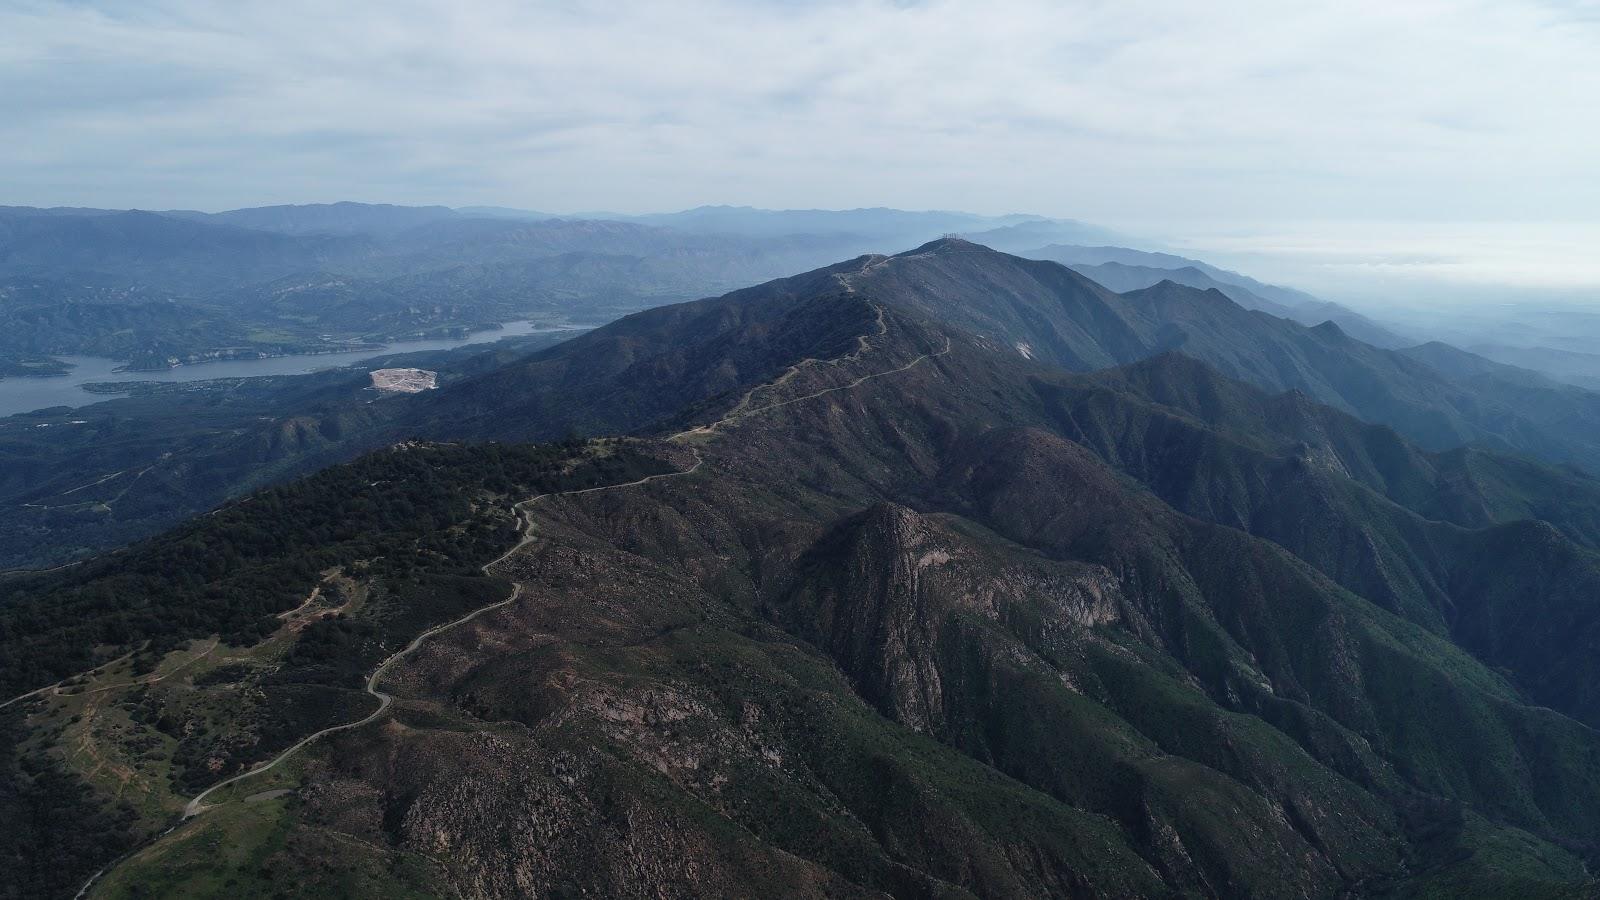 Bike climb Refugio Road Climb - W. Camino Cielo - aerial drone photo of roadway, mountains, finish